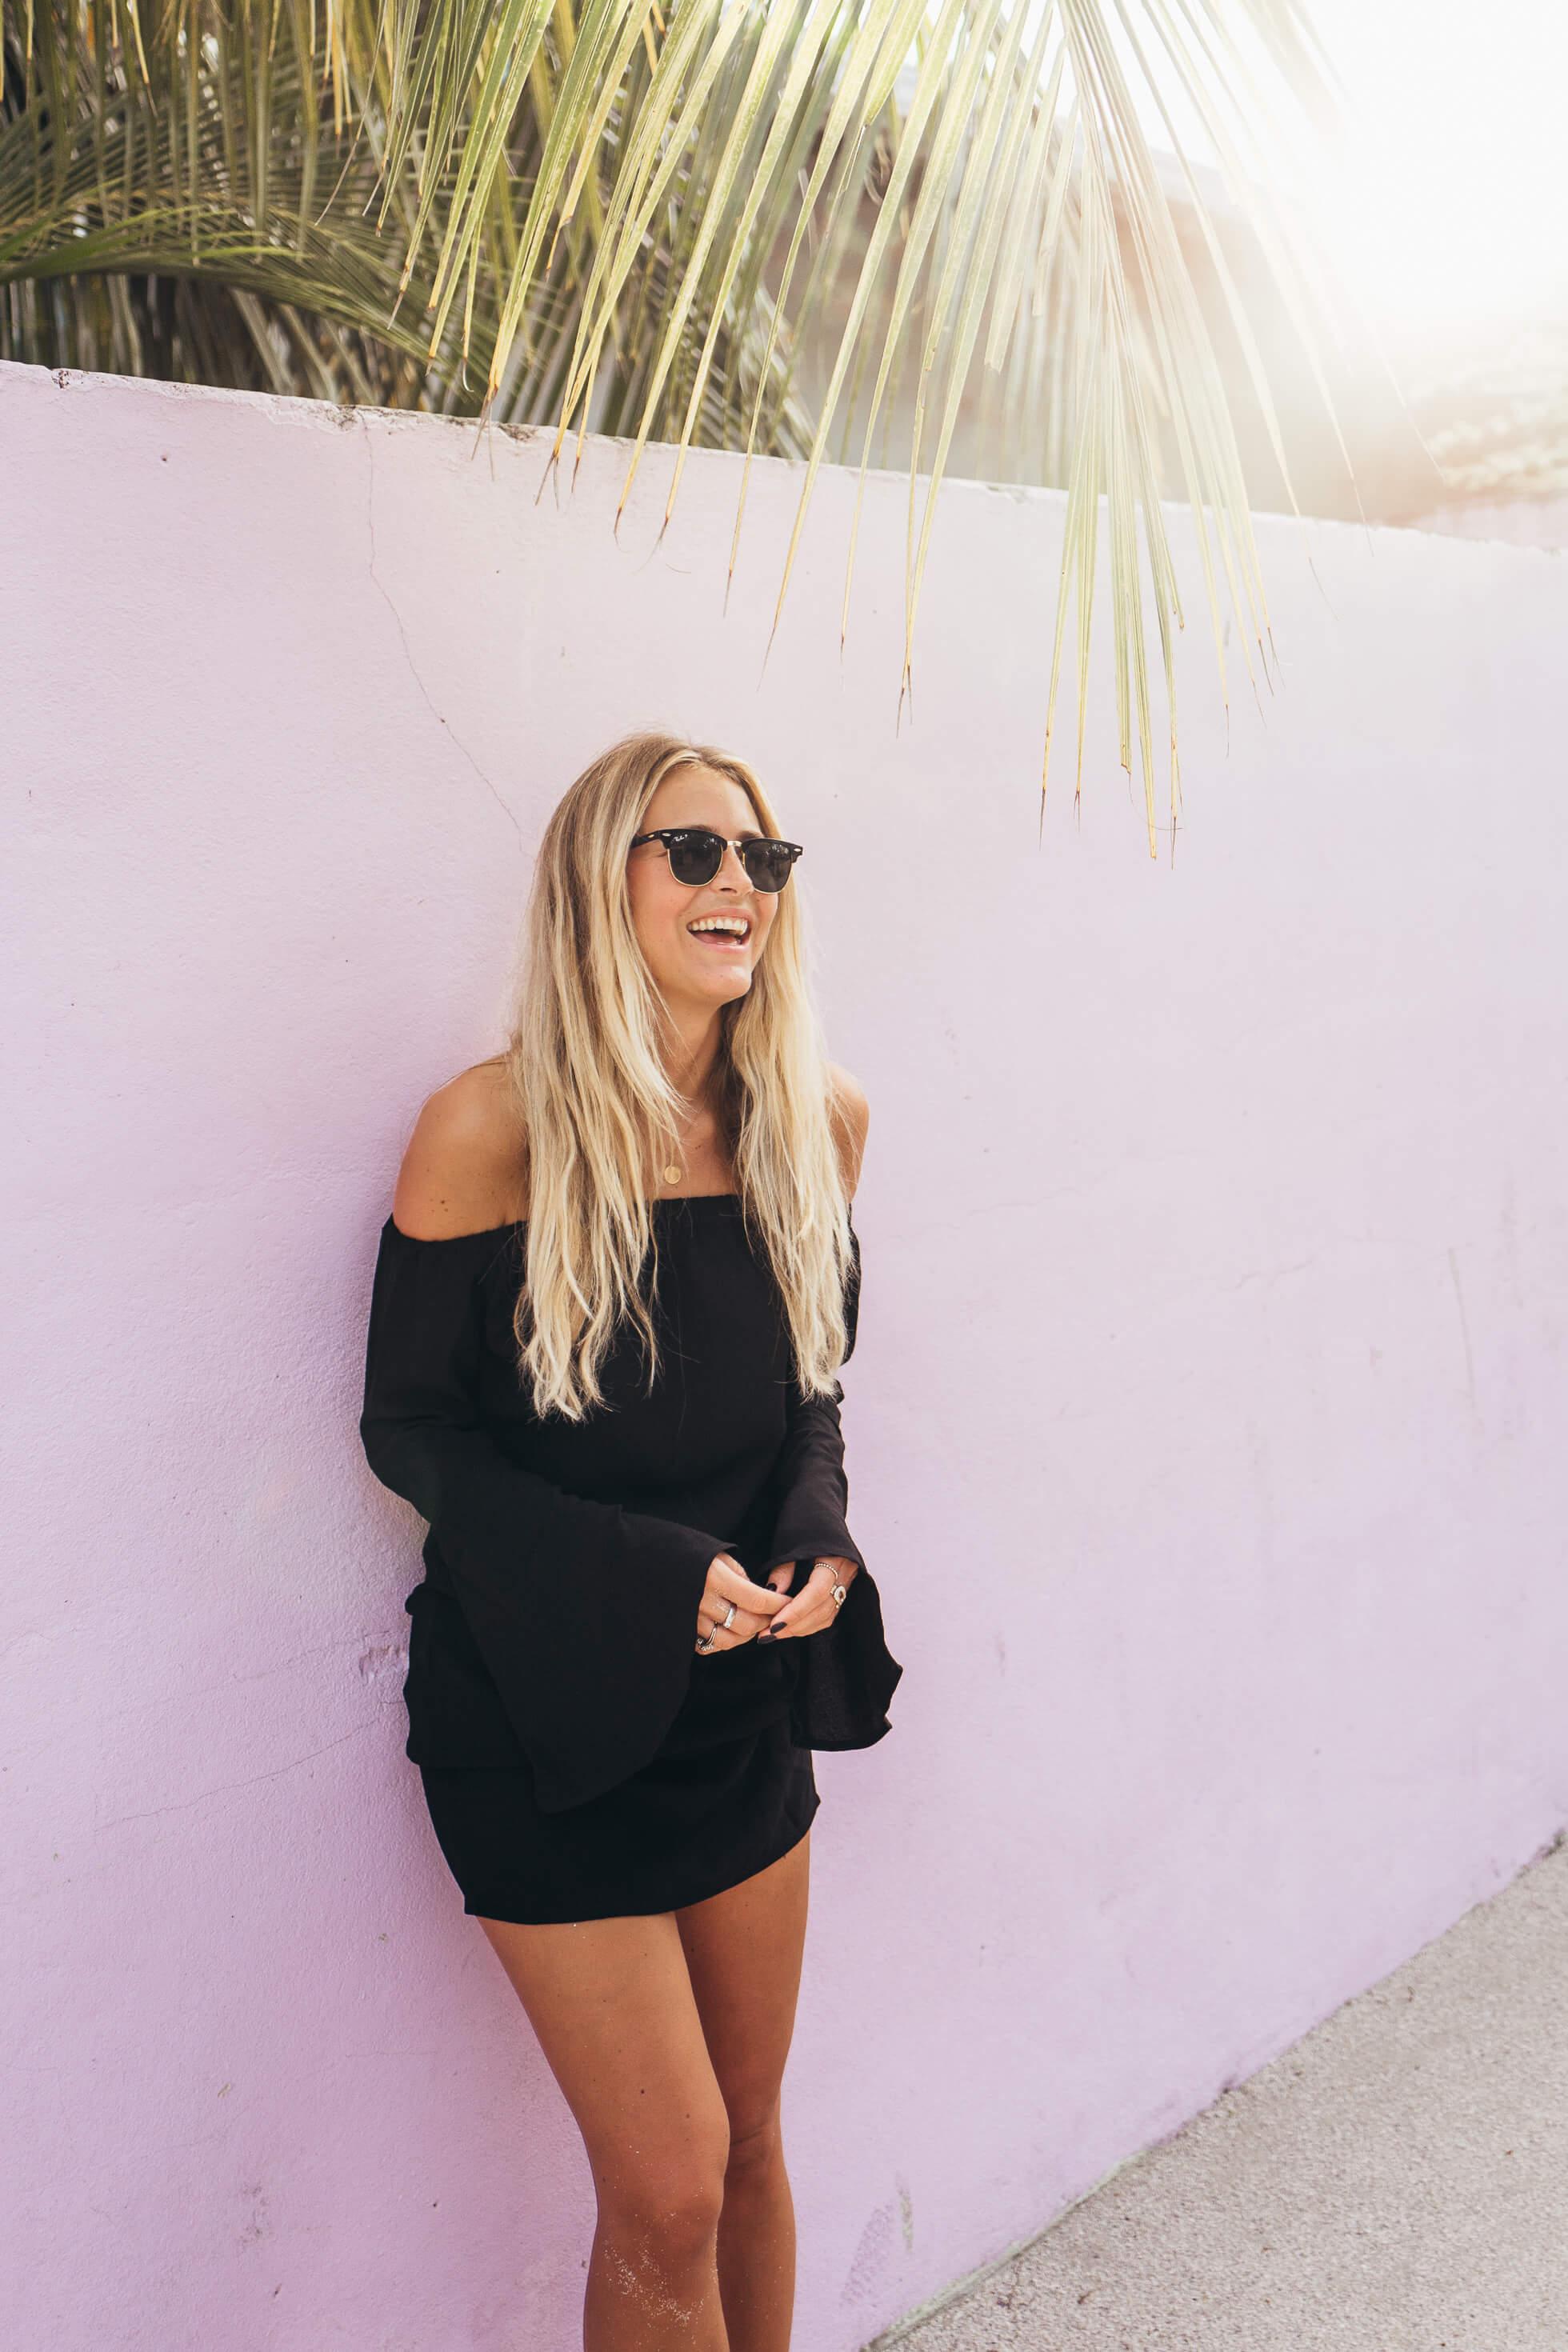 janni-deler-pink-walls-maldivesl1120292